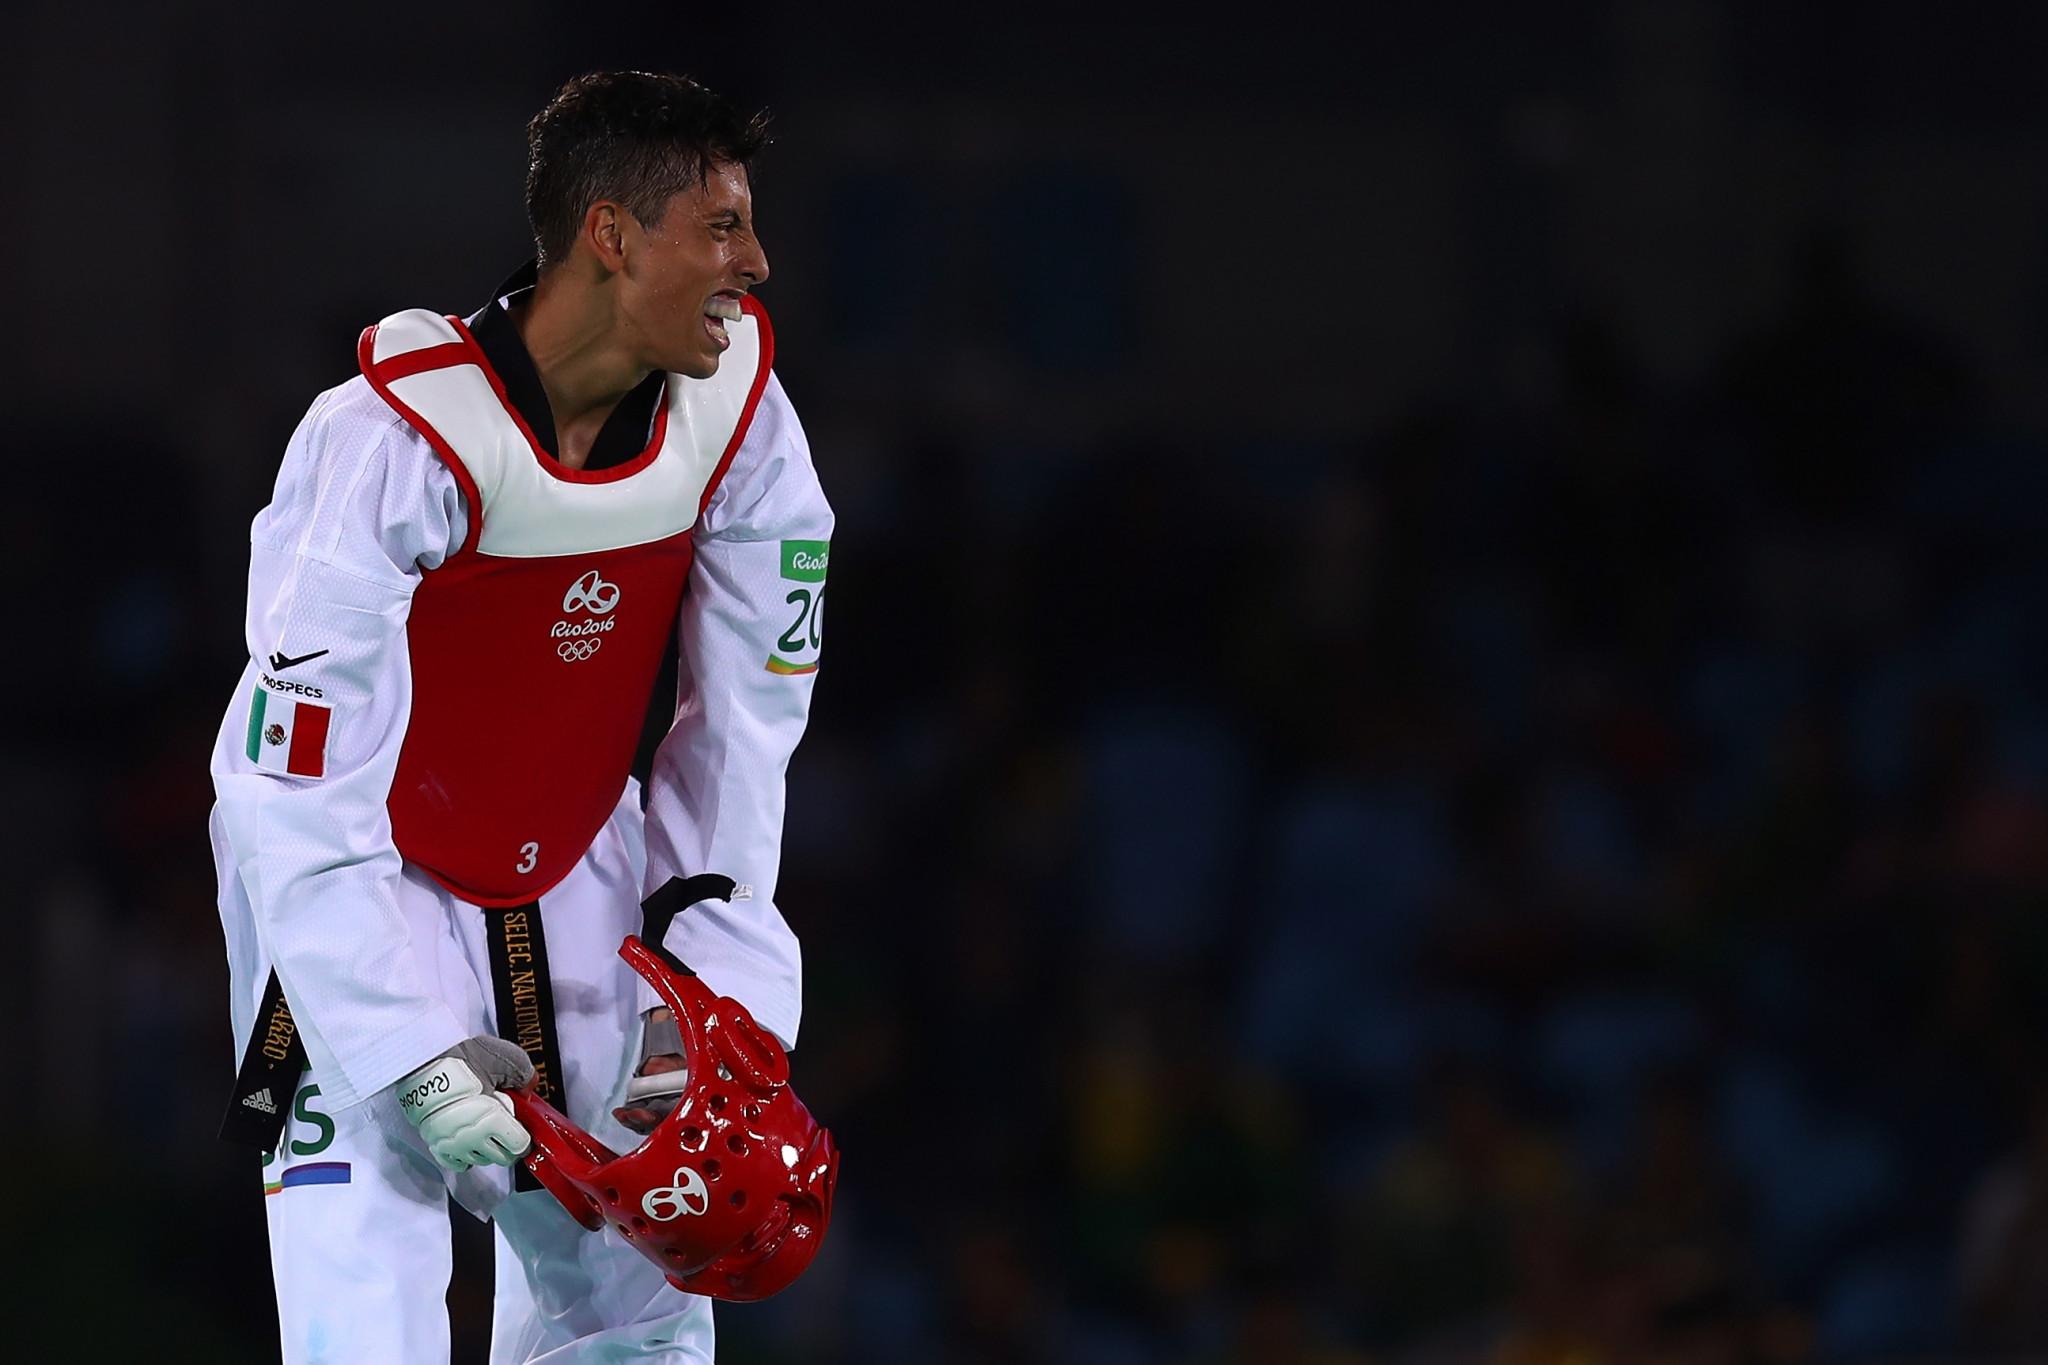 Golden hauls for Mexico, US and Brazil at Pan American Taekwondo Championships